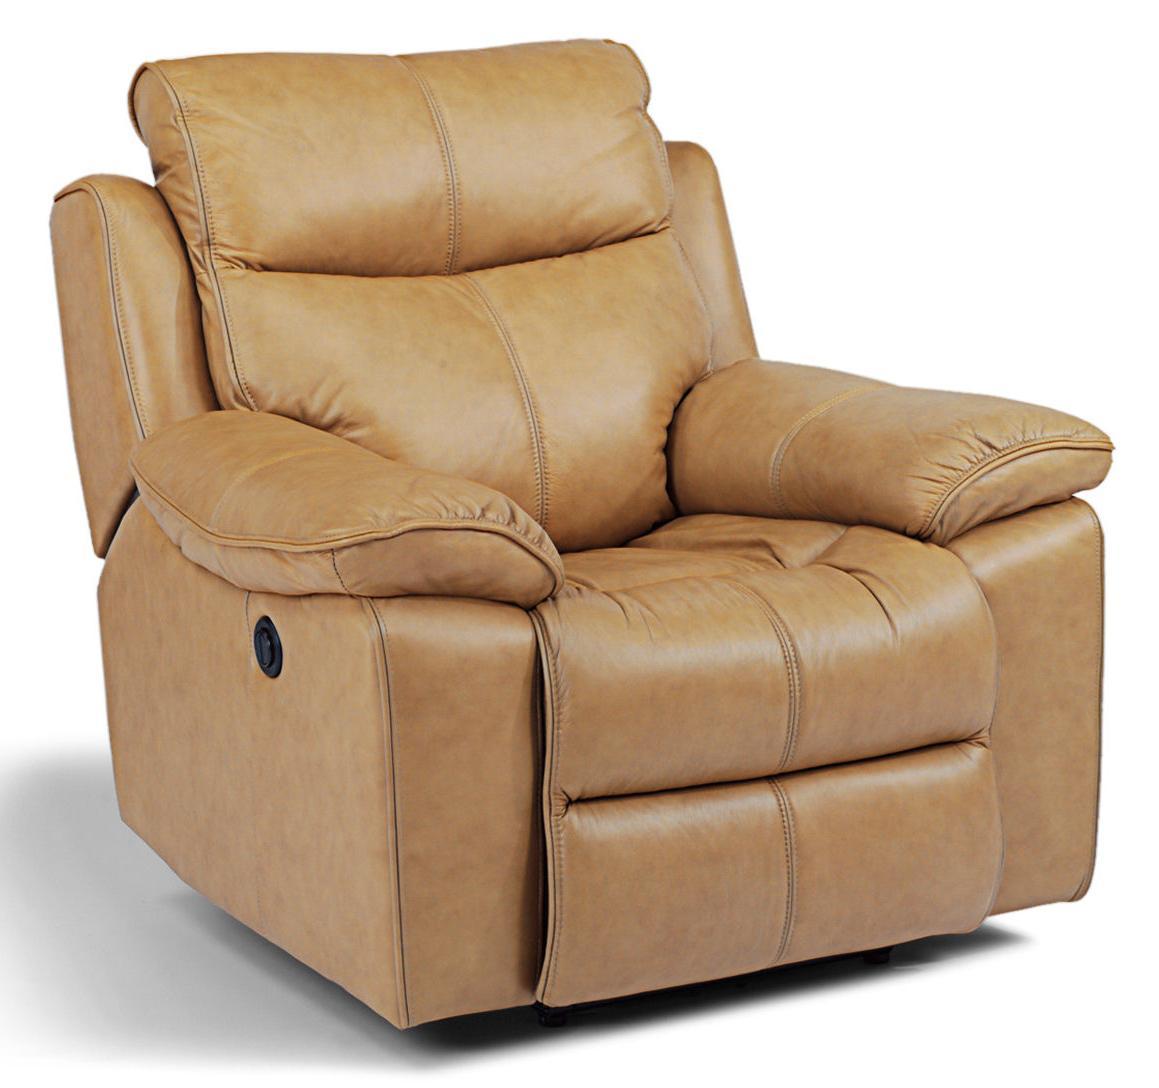 flexsteel julio reclining sofa capitola convertible chaise recliners fleet street